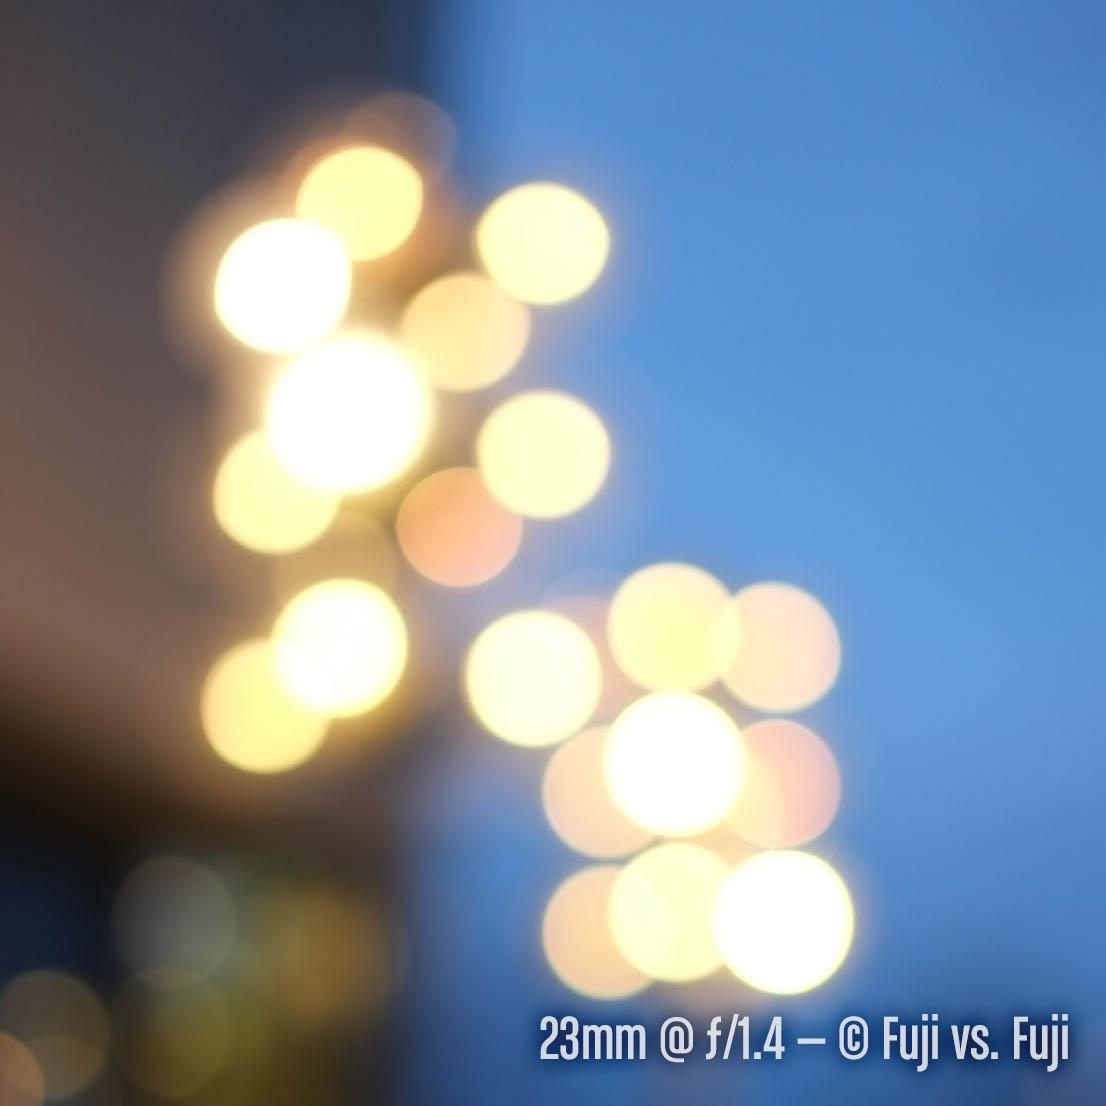 fujivsfuji-lightsphere-23@1pt4.jpg